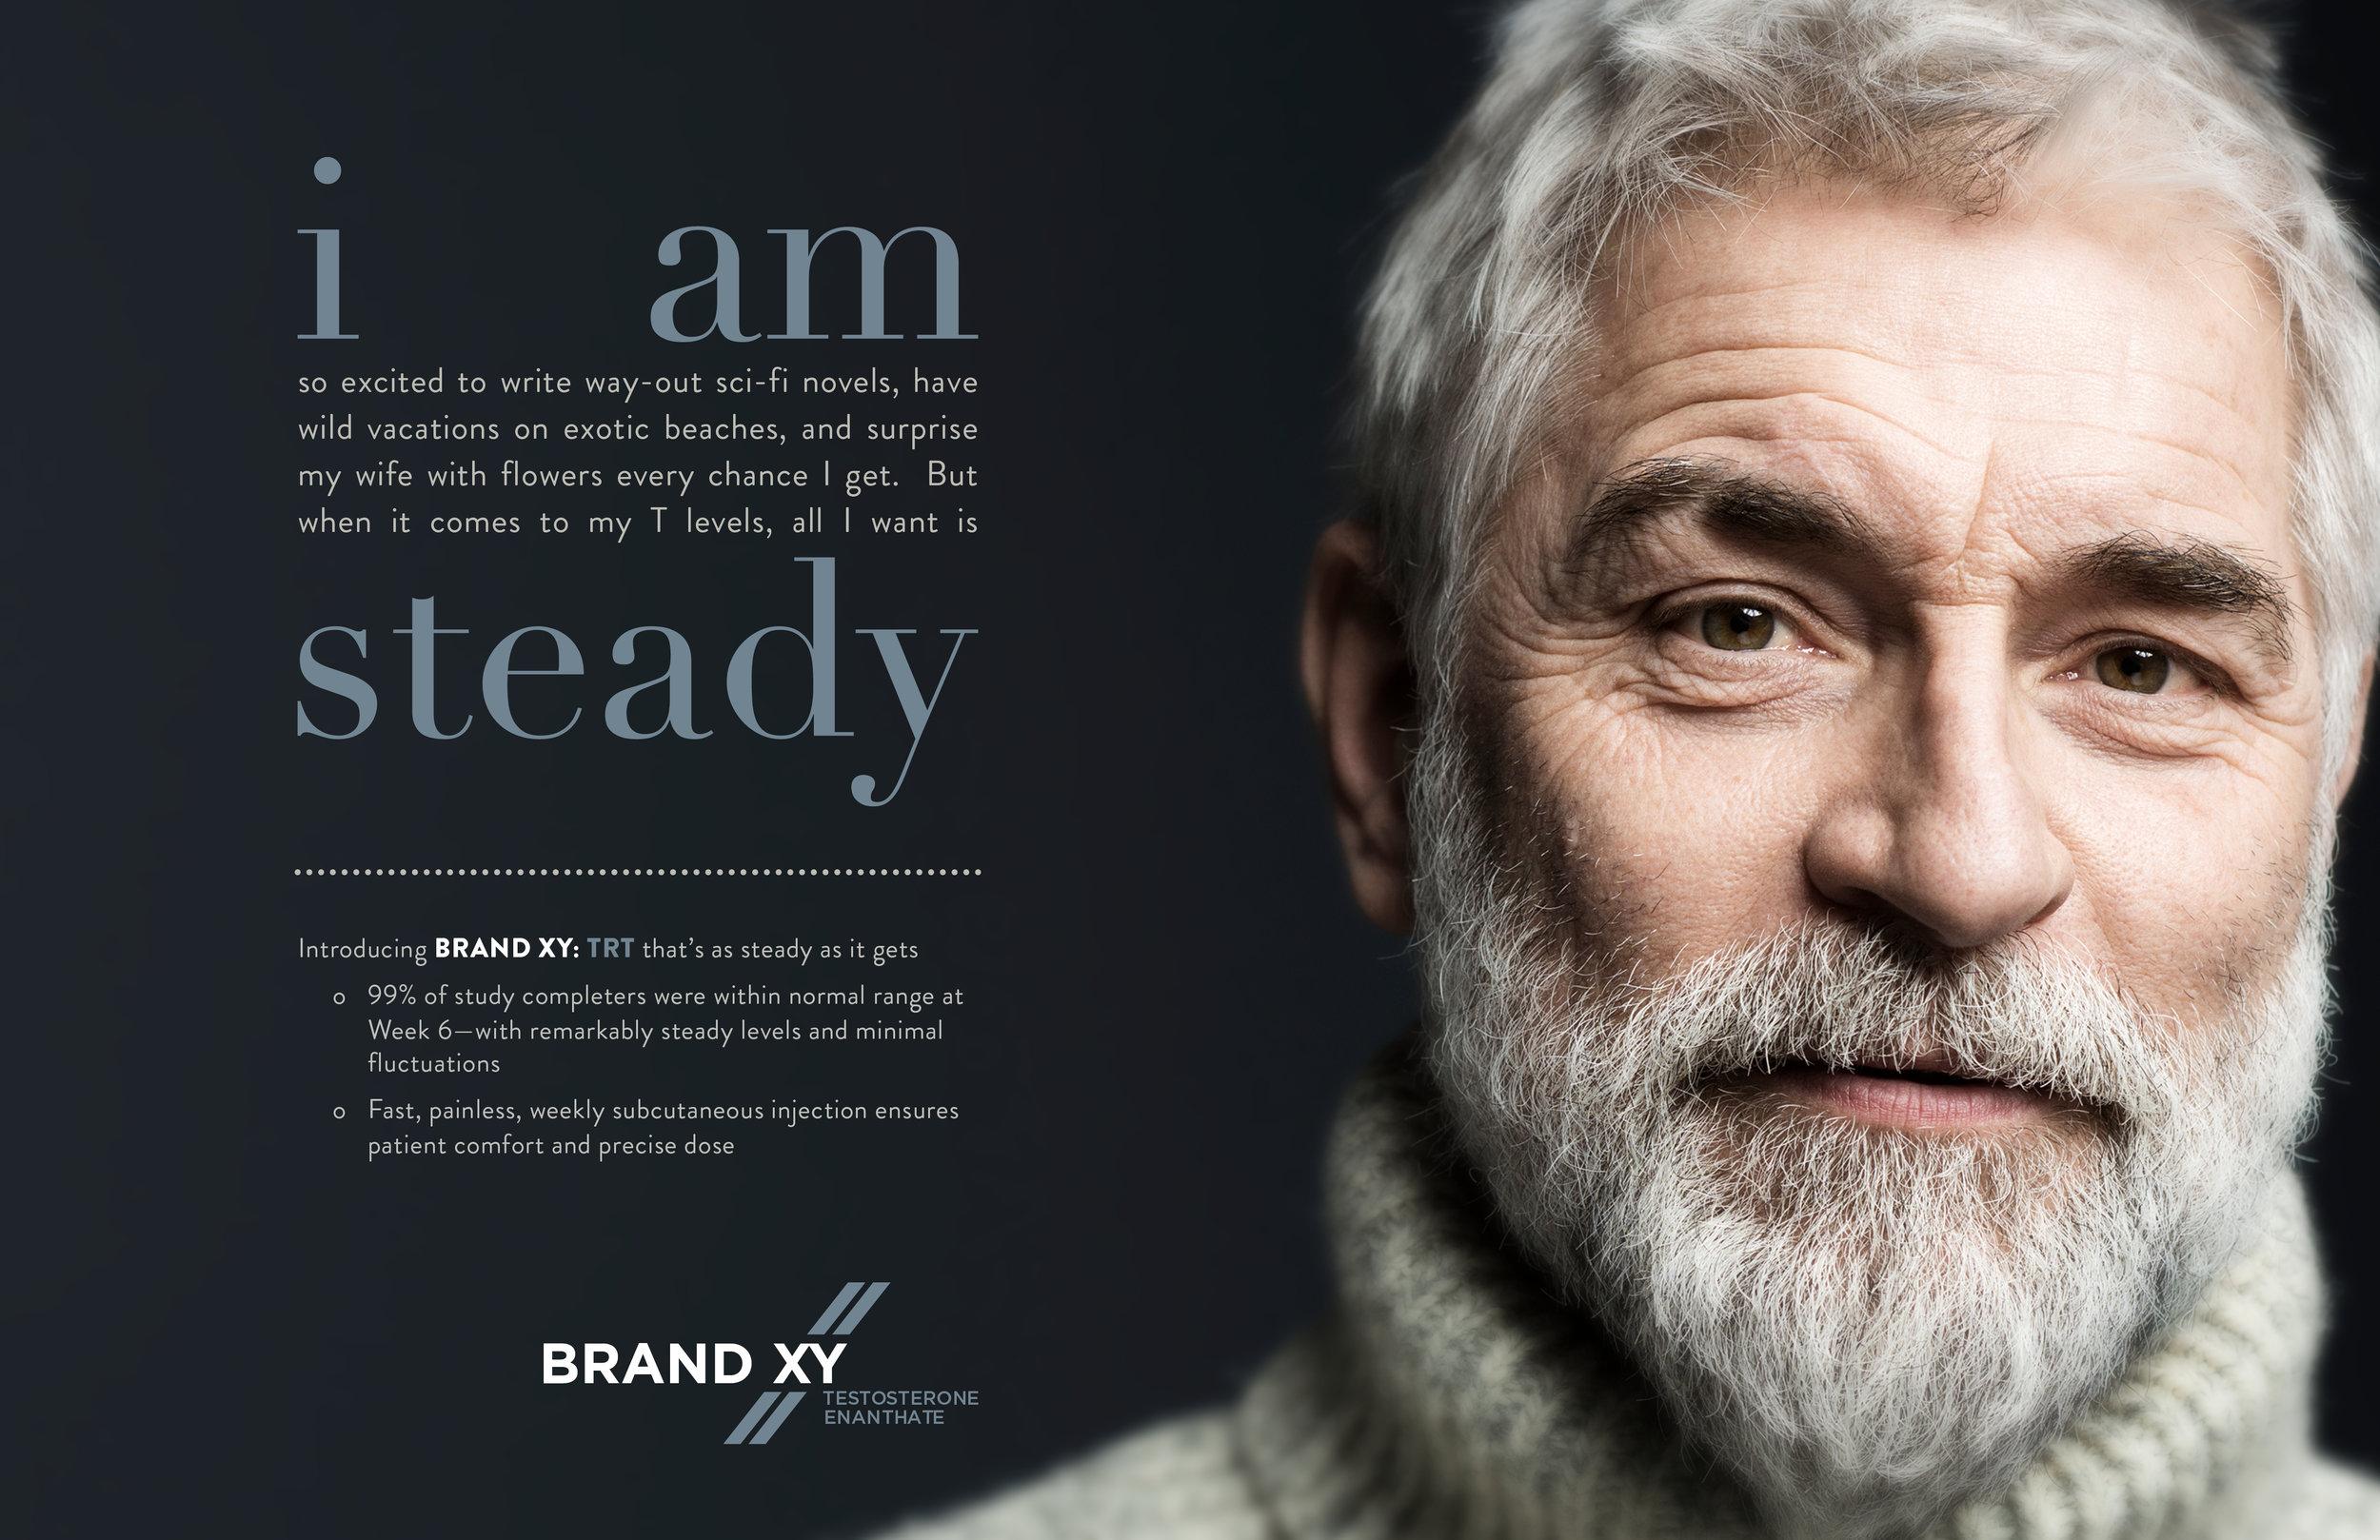 Steady Ads 22.jpg